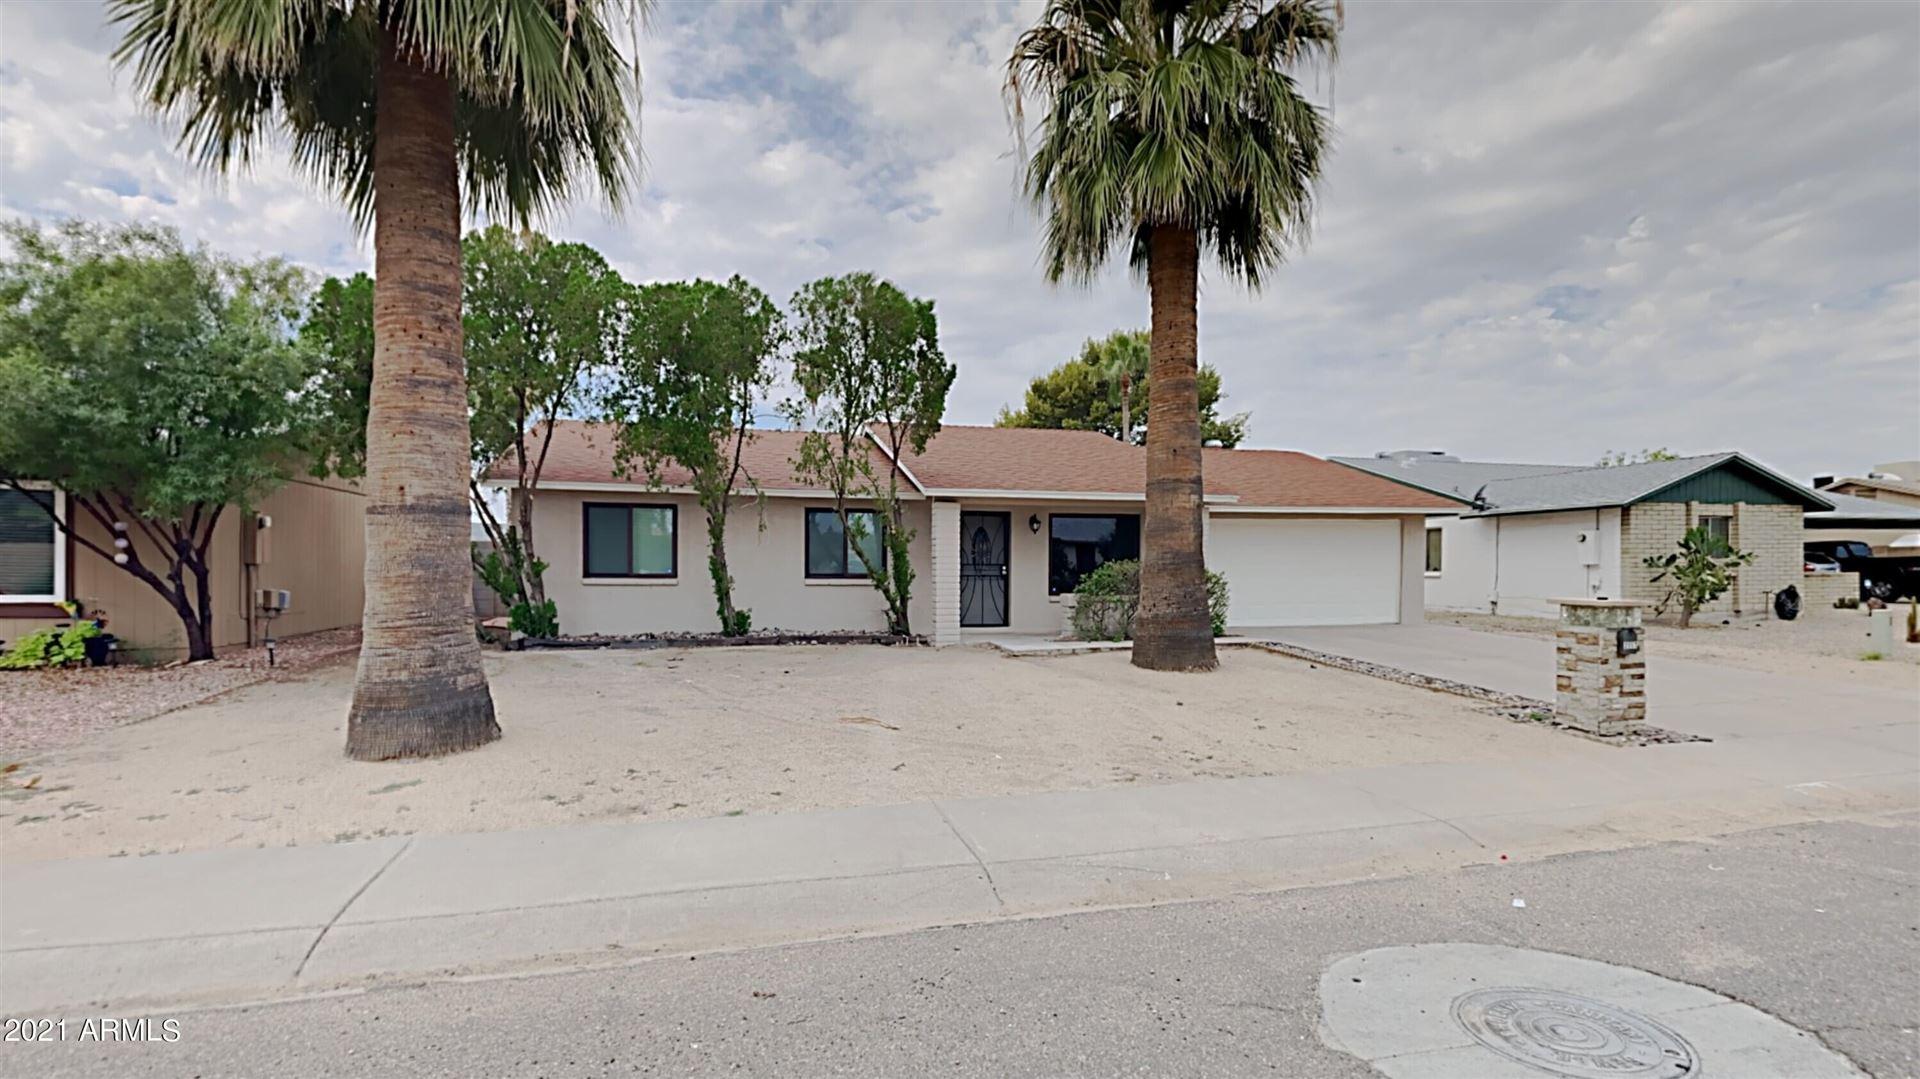 3557 E HELENA Drive, Phoenix, AZ 85032 - MLS#: 6296445